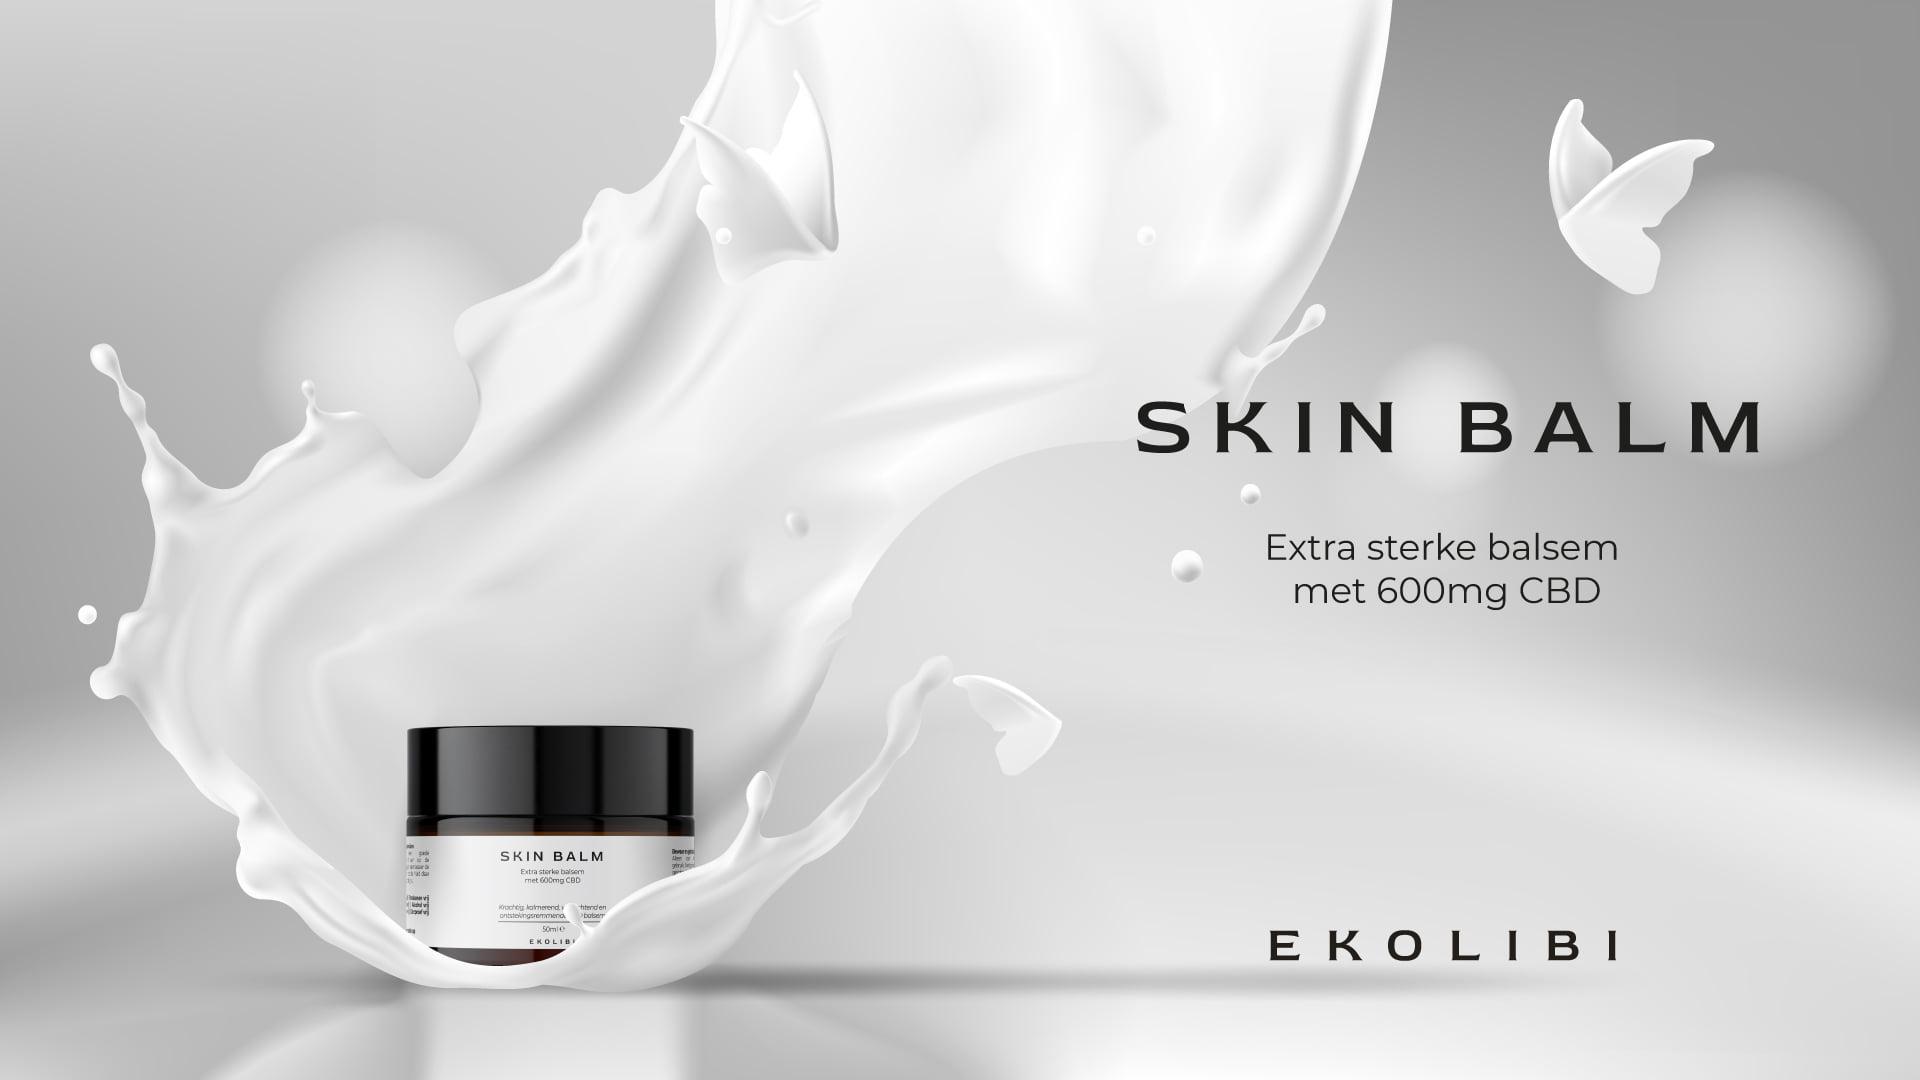 Ekolibi CBD Skin Balm (600mg CBD) 50ml